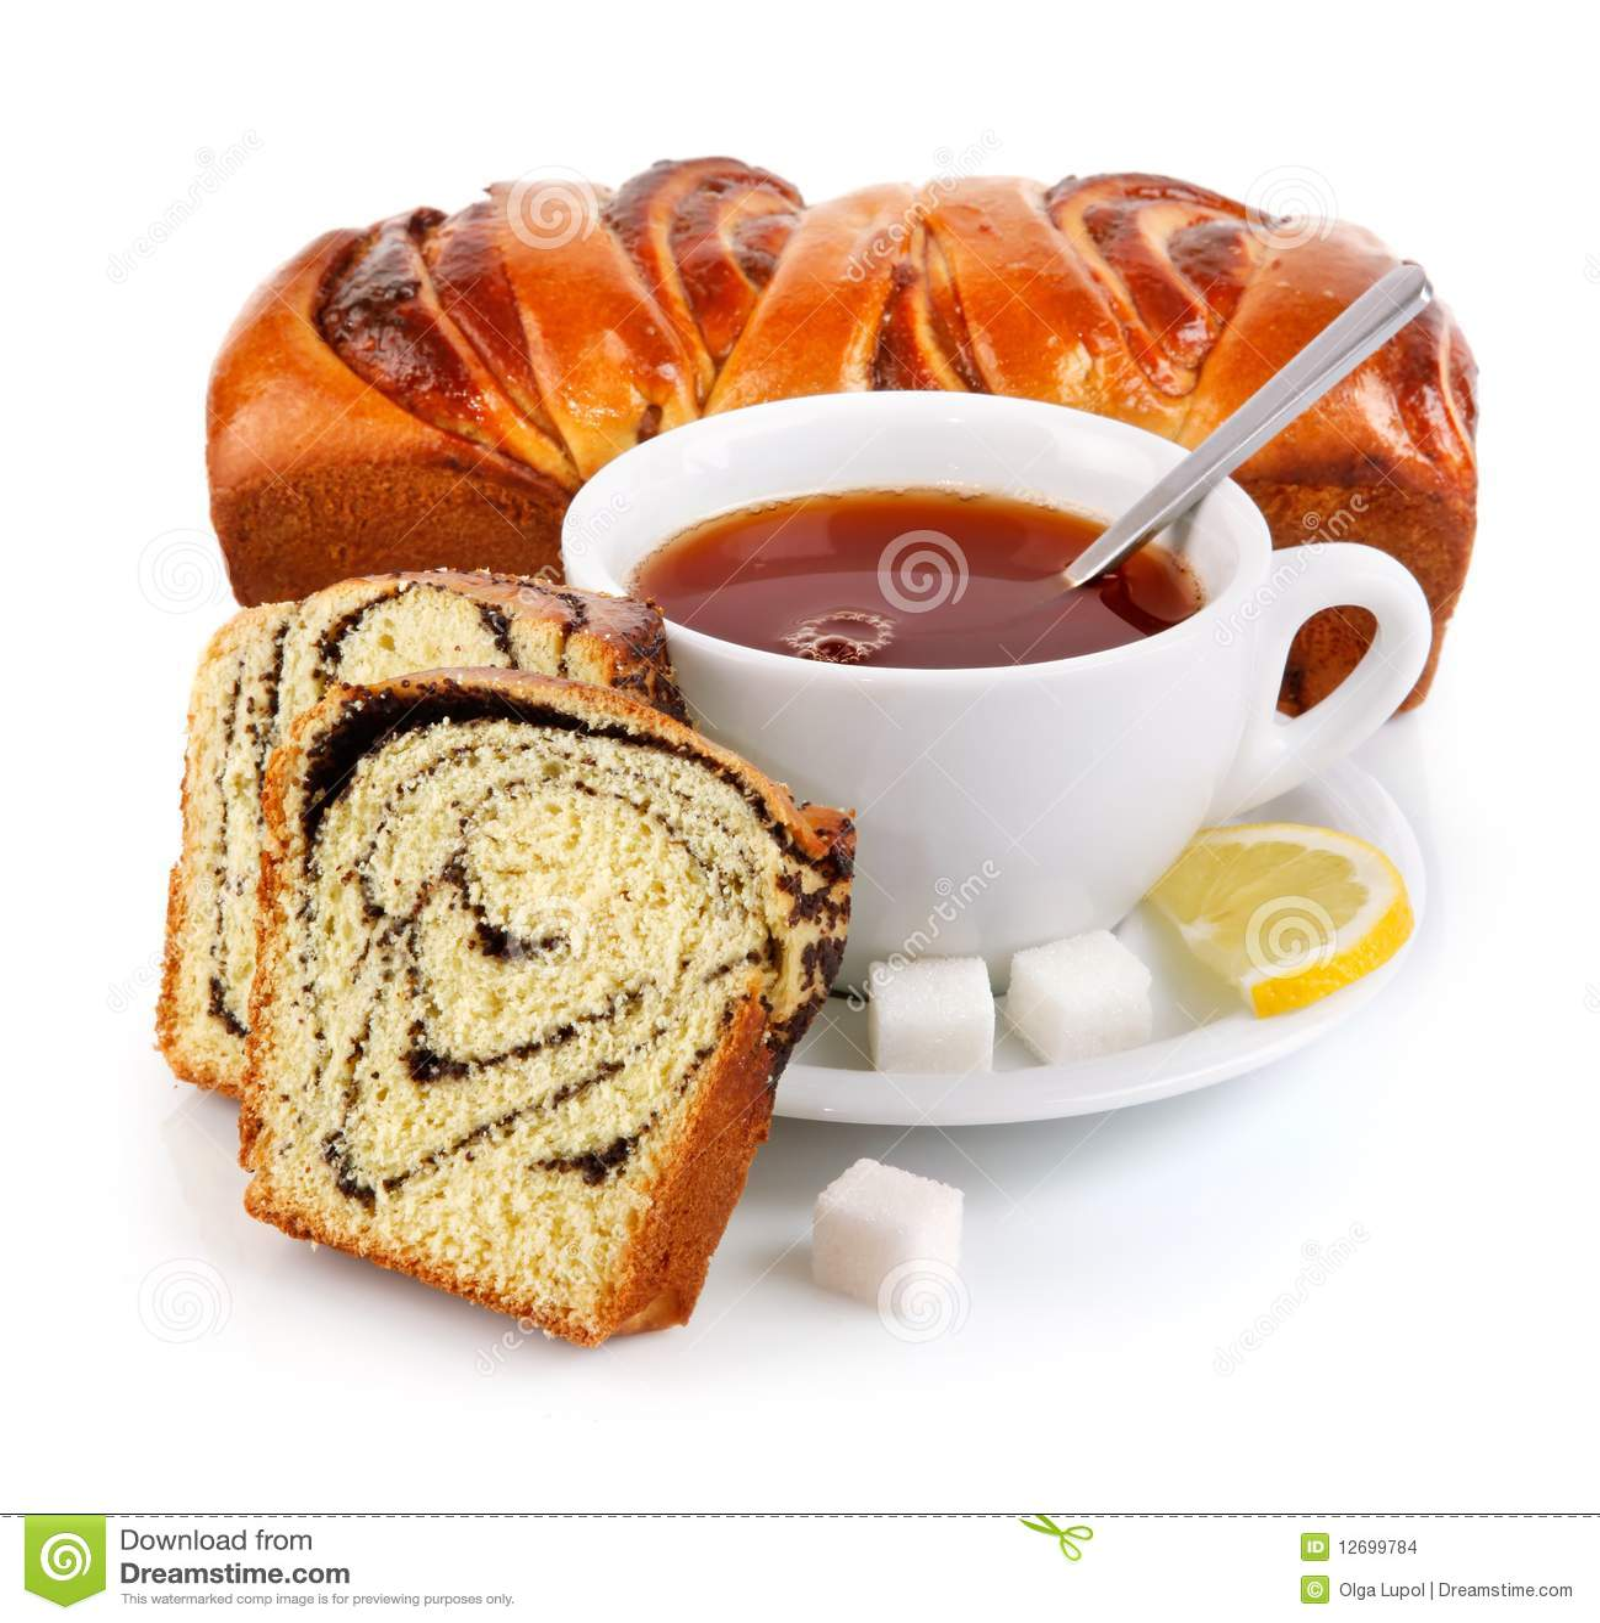 how to cut the sweetness of tea